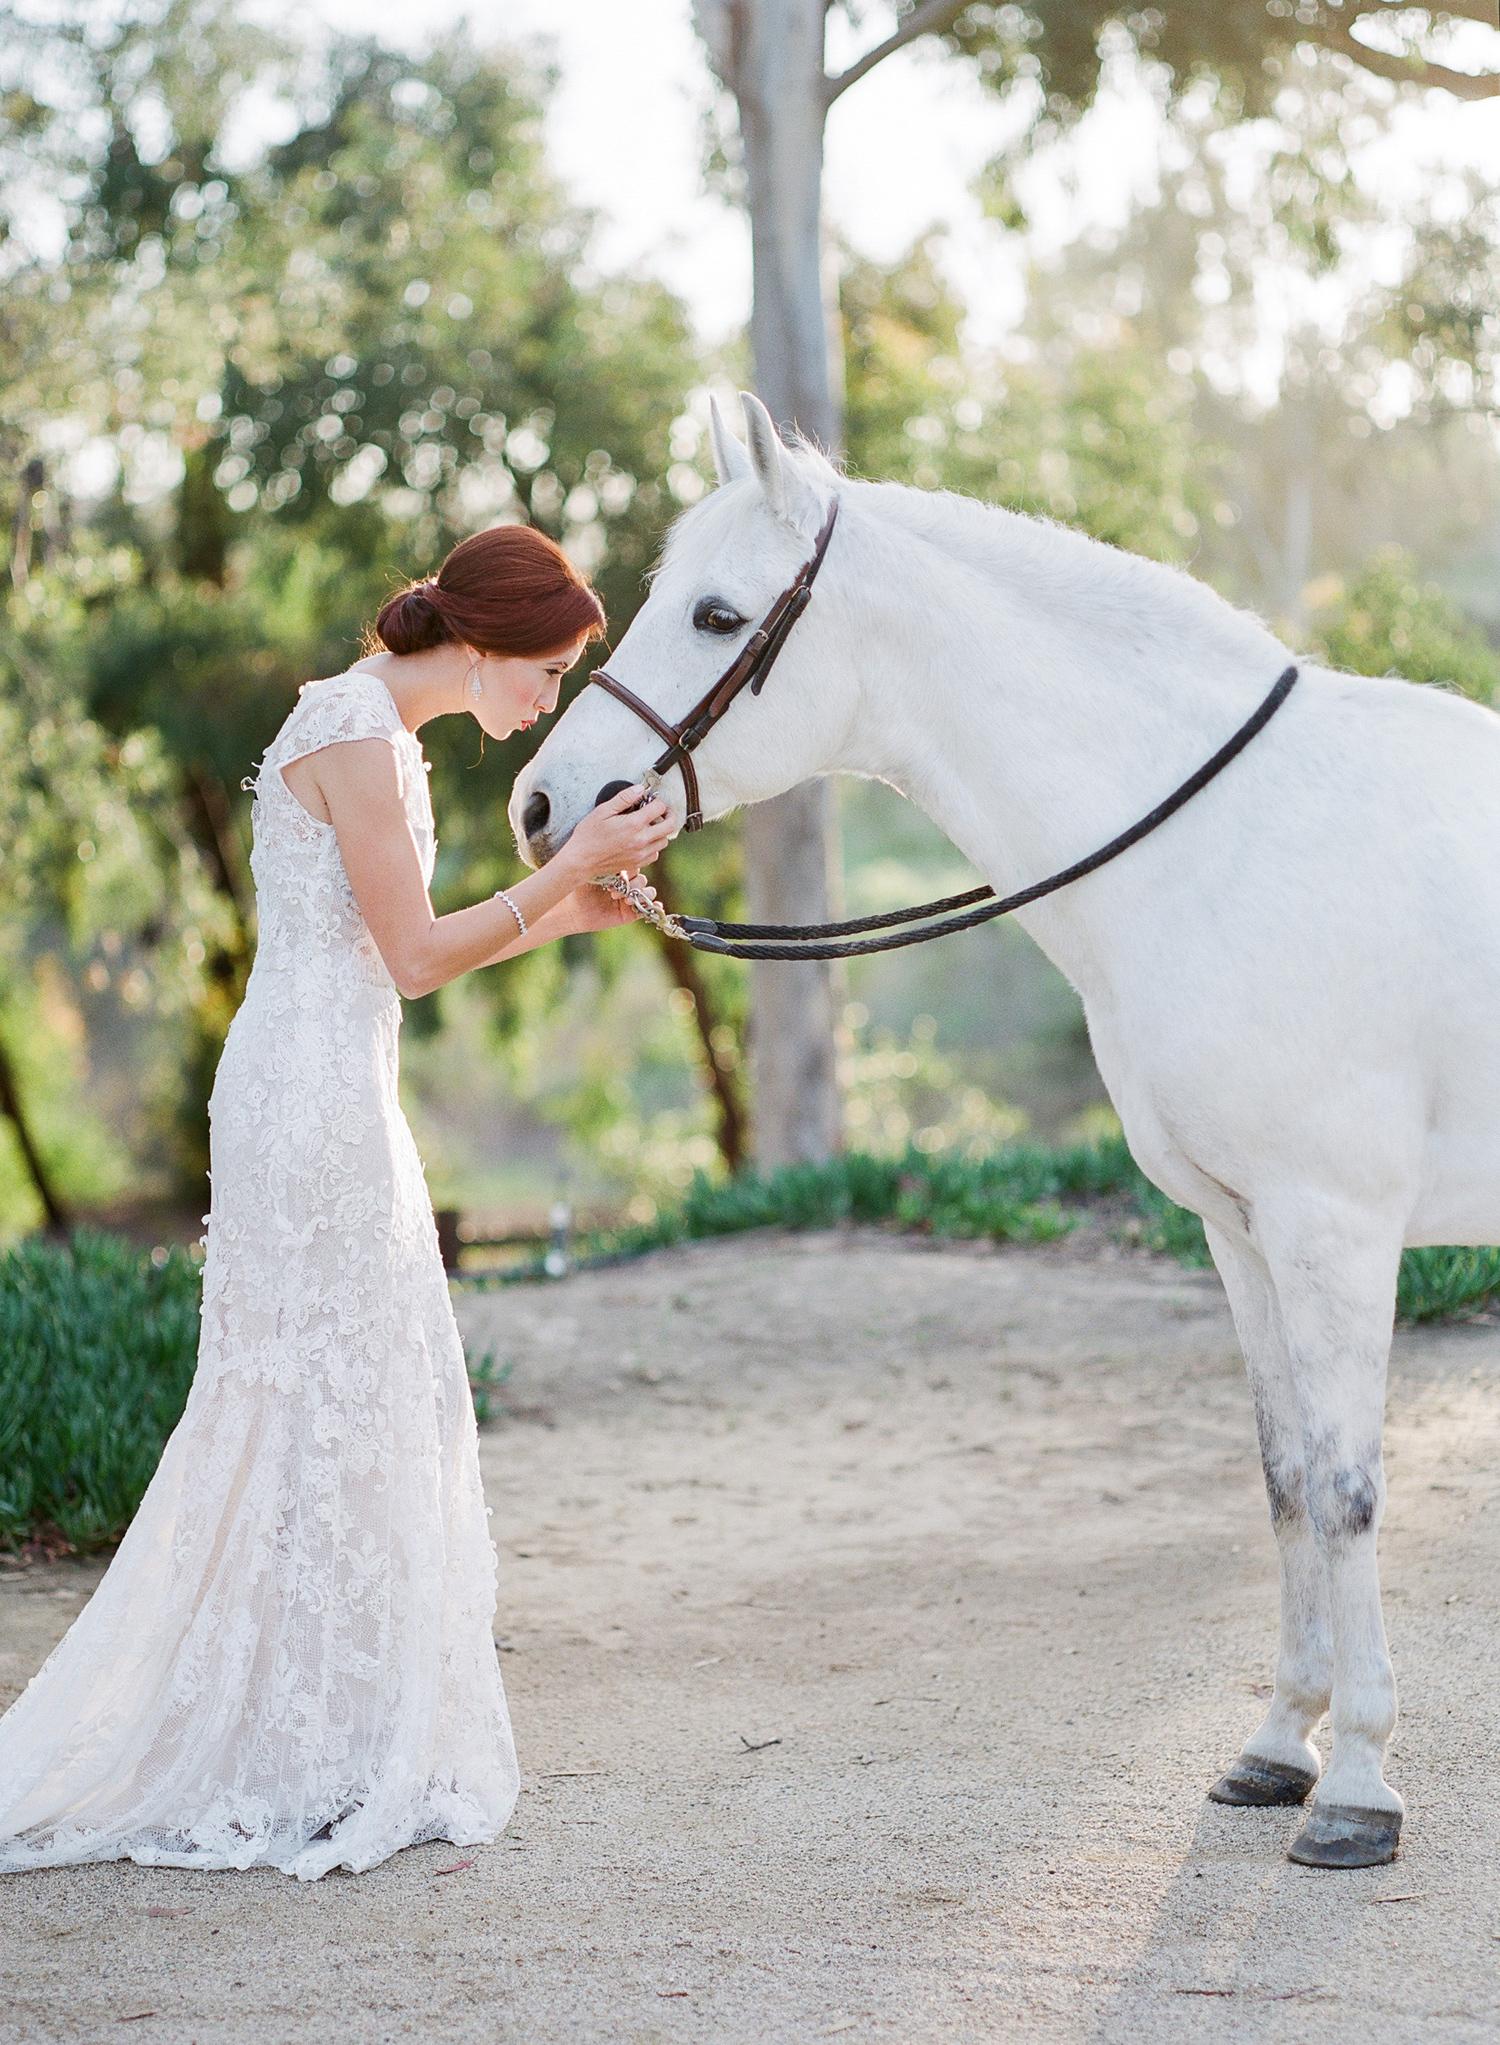 020-Jen-Wojcik-Photography-San-Diego-Wedding-Photographer.jpg